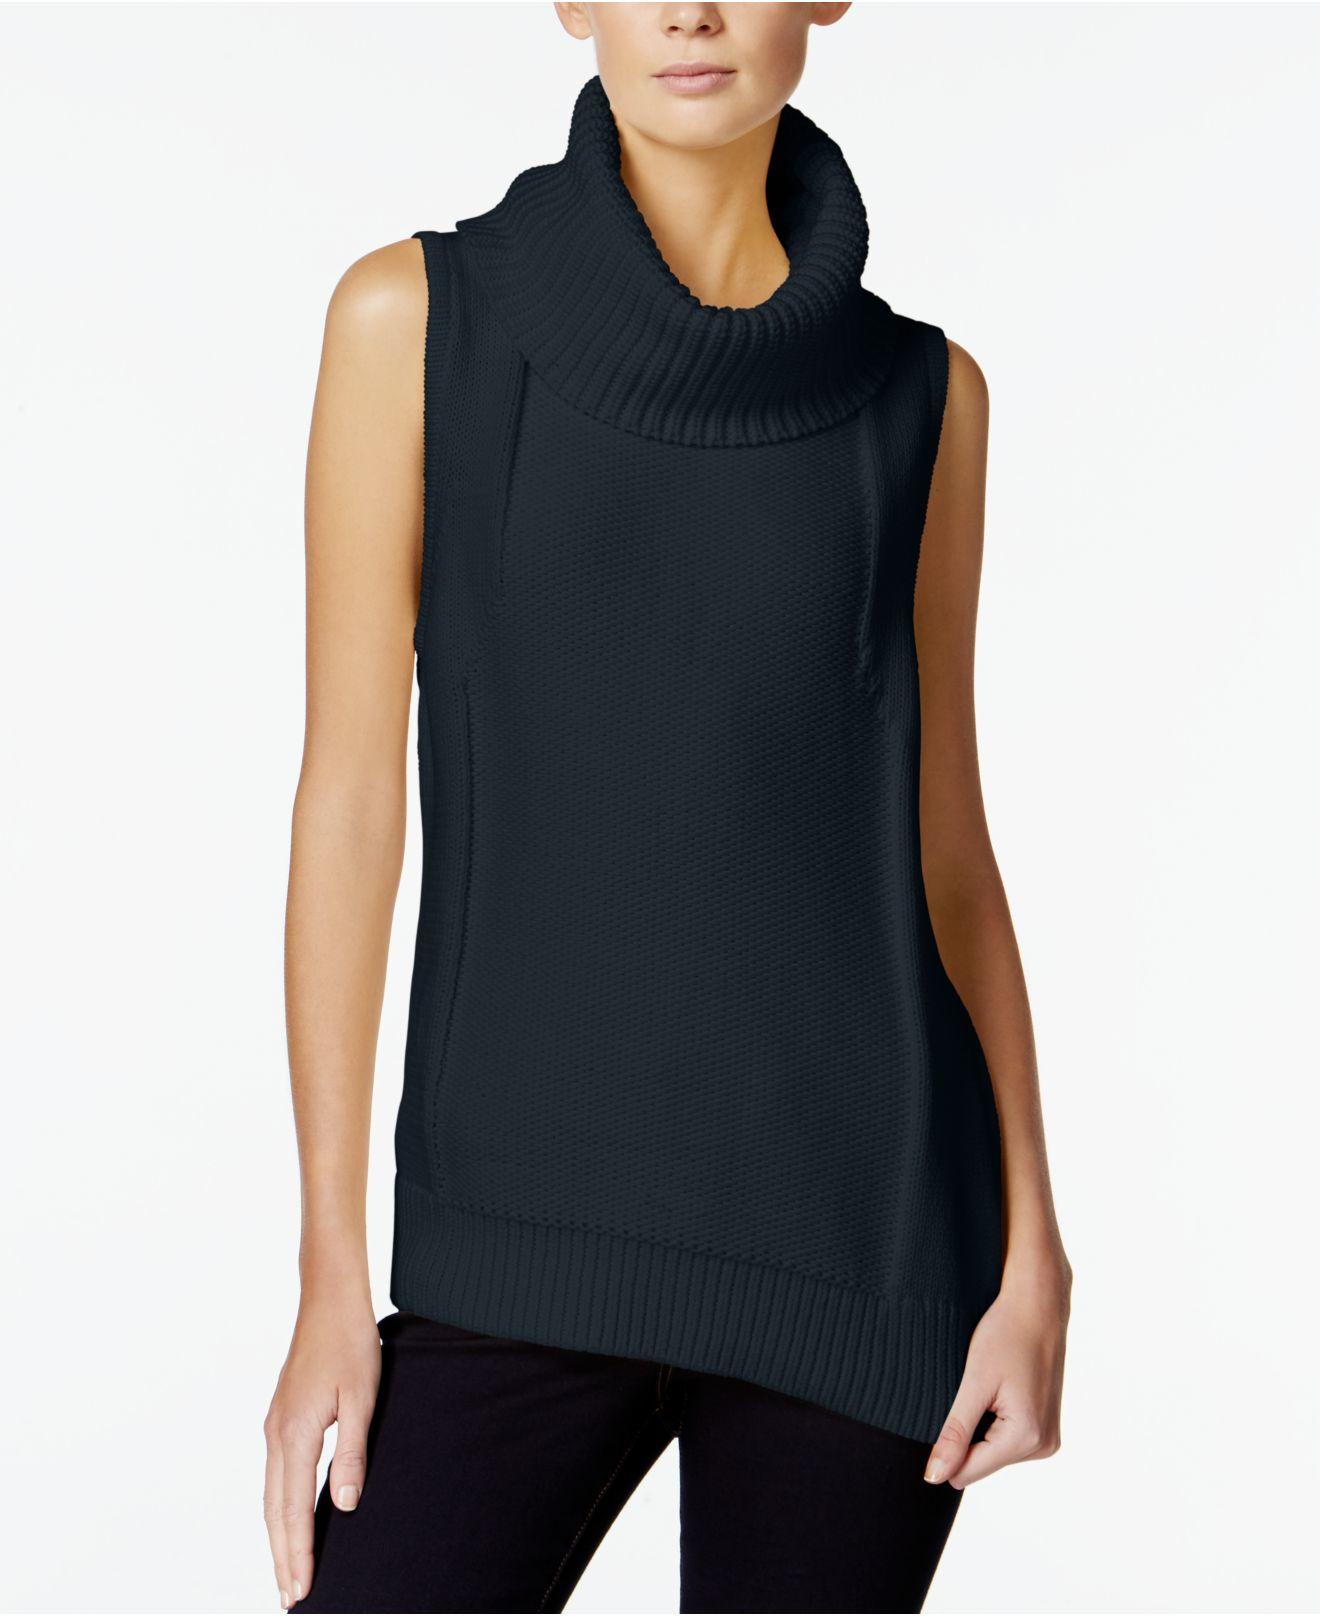 Smartwool Sweaters